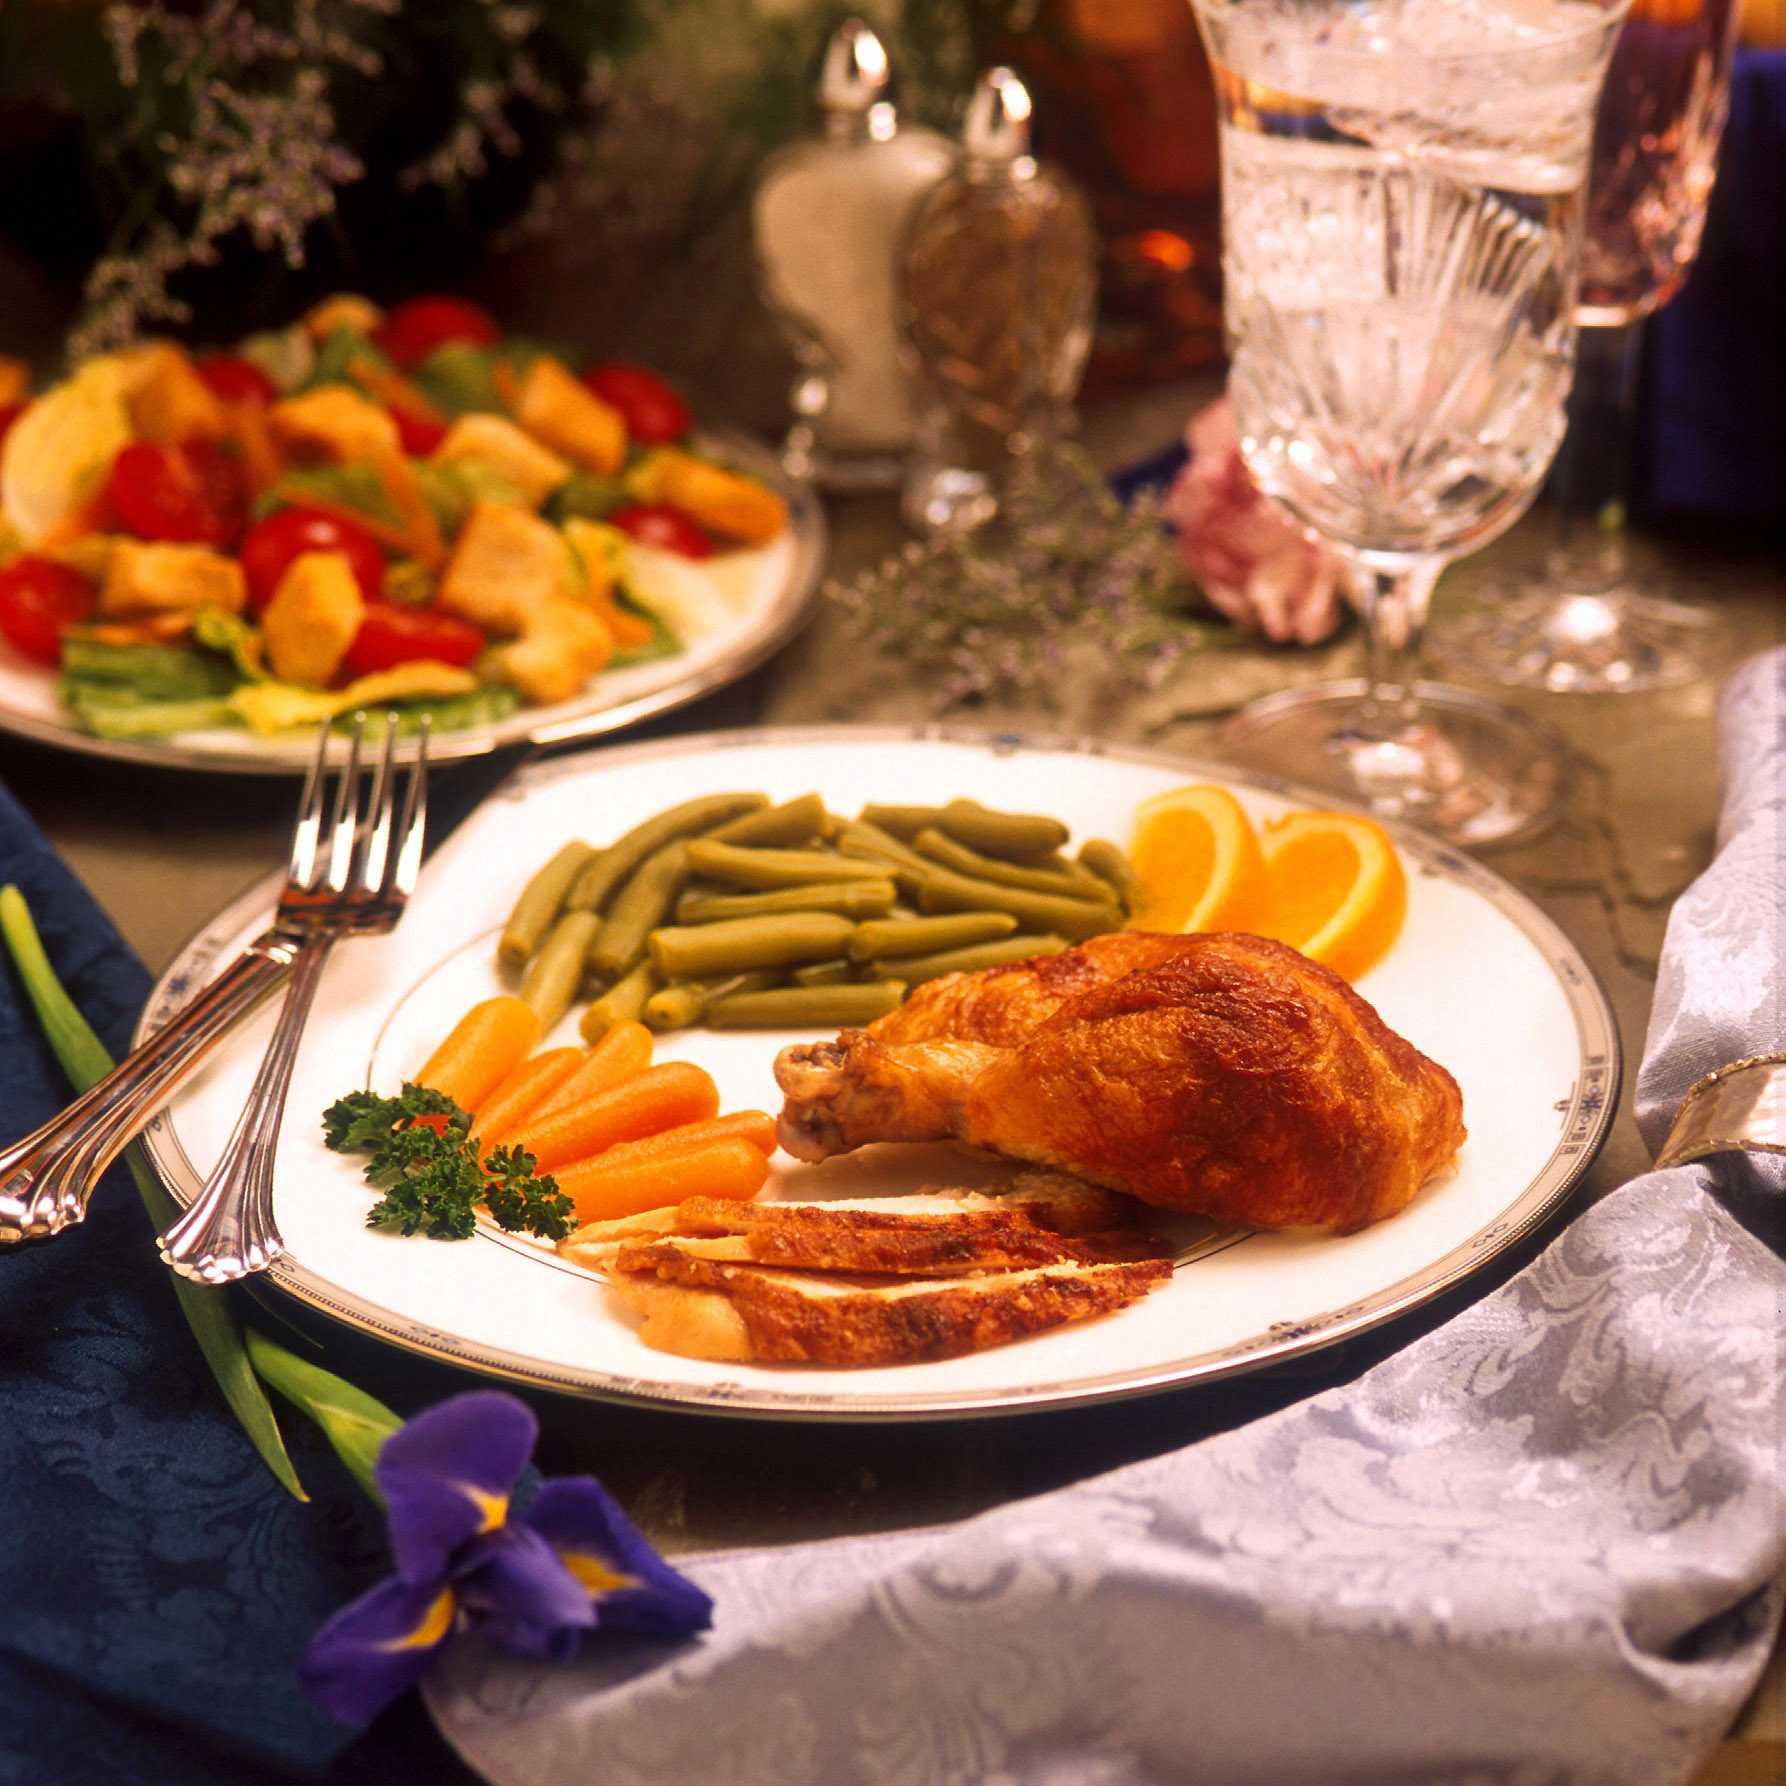 lunch versus dinner versus supper essay